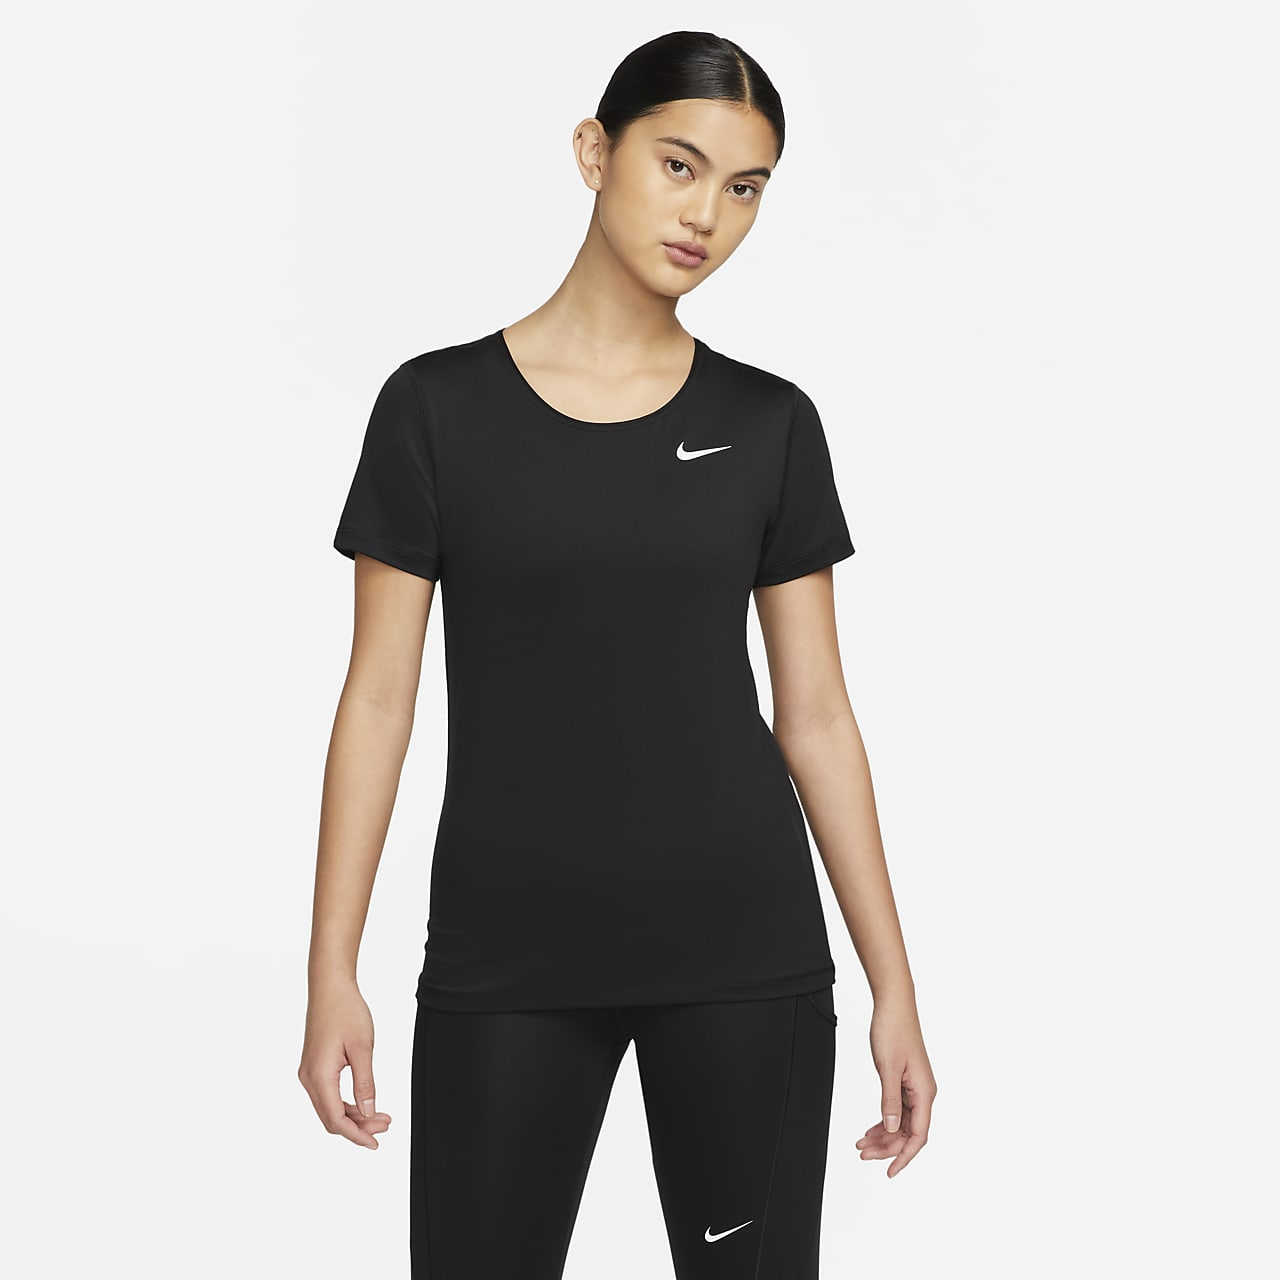 d0cd6ec5604d Γυναικεία κοντομάνικη μπλούζα προπόνησης Nike Pro. Nike.com GR